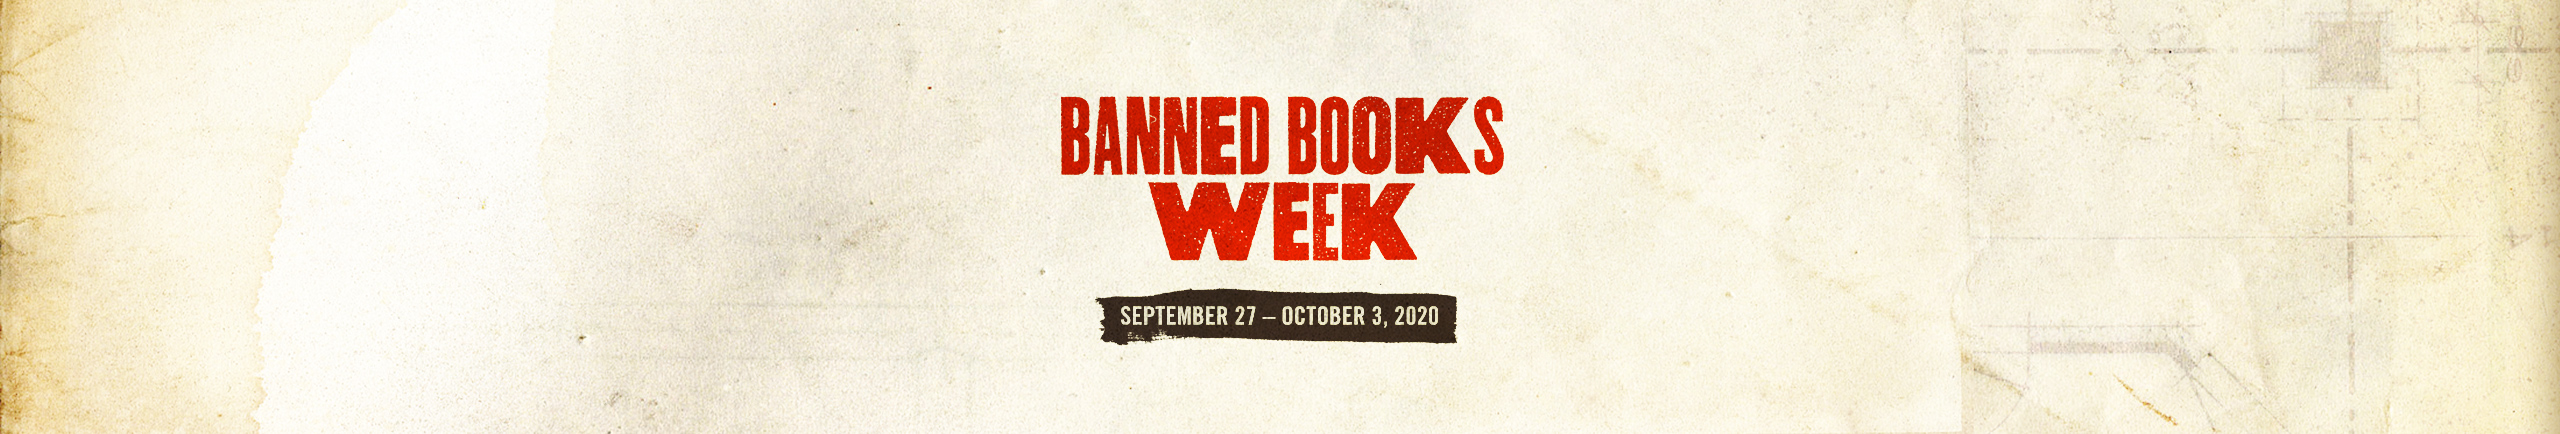 Banned Books Week September 27 – October 3, 2020